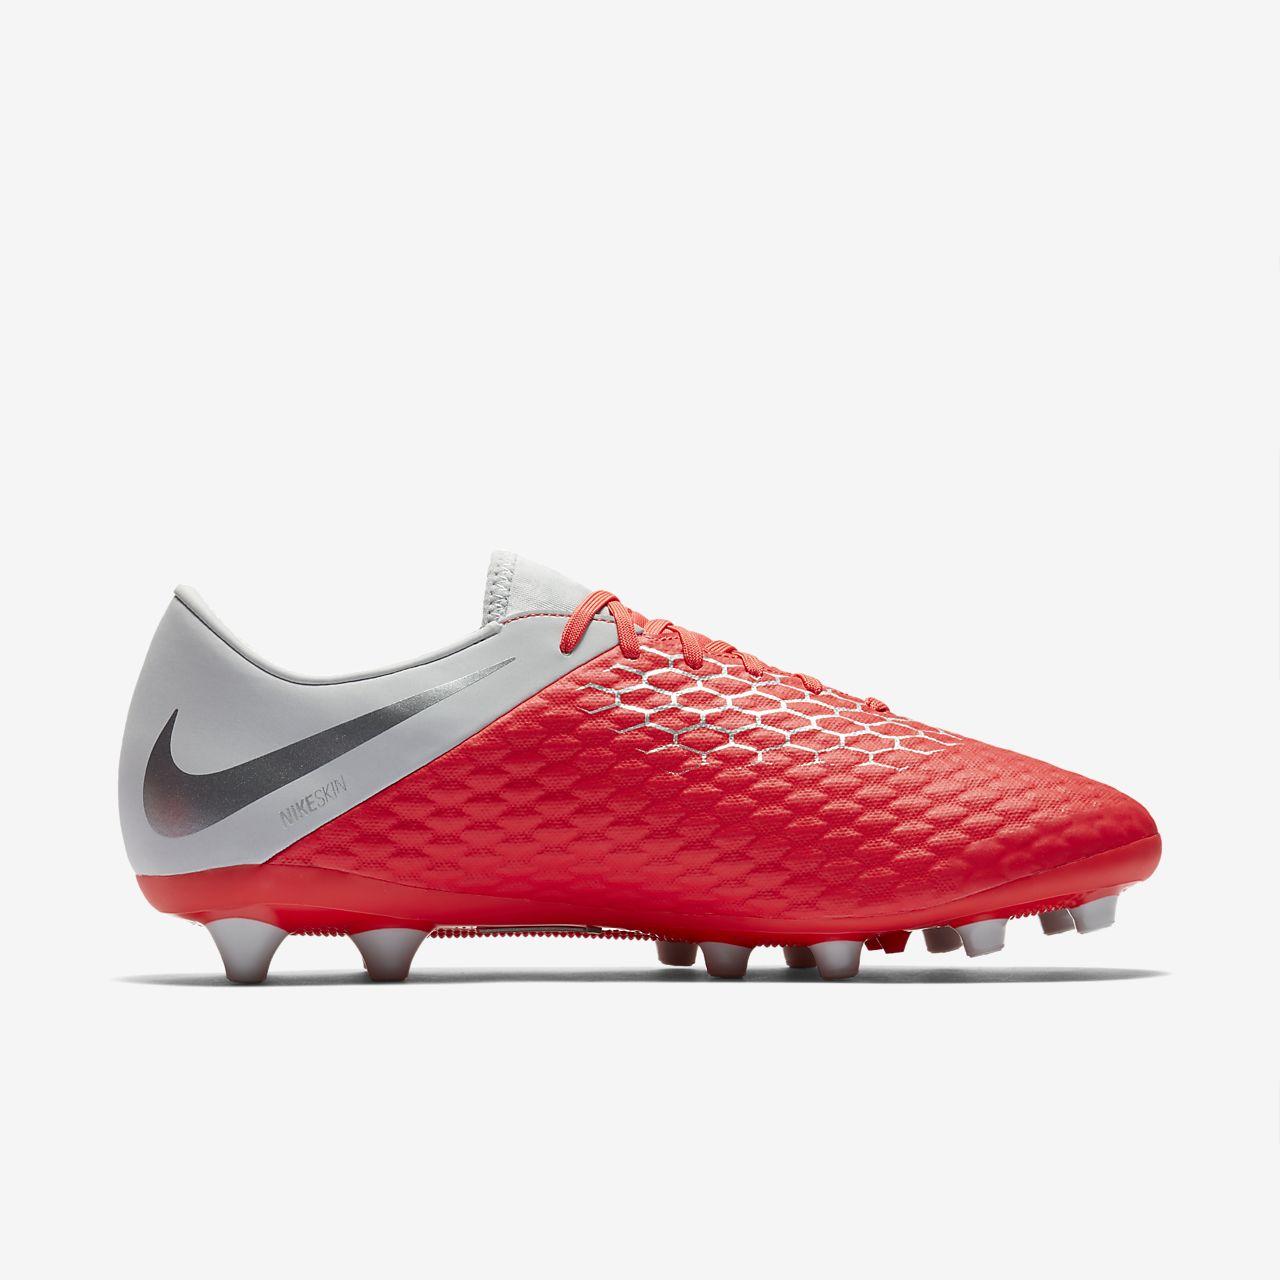 0cabd7d43fff0 ... Calzado de fútbol para pasto artificial Nike Hypervenom III Academy  AG-PRO